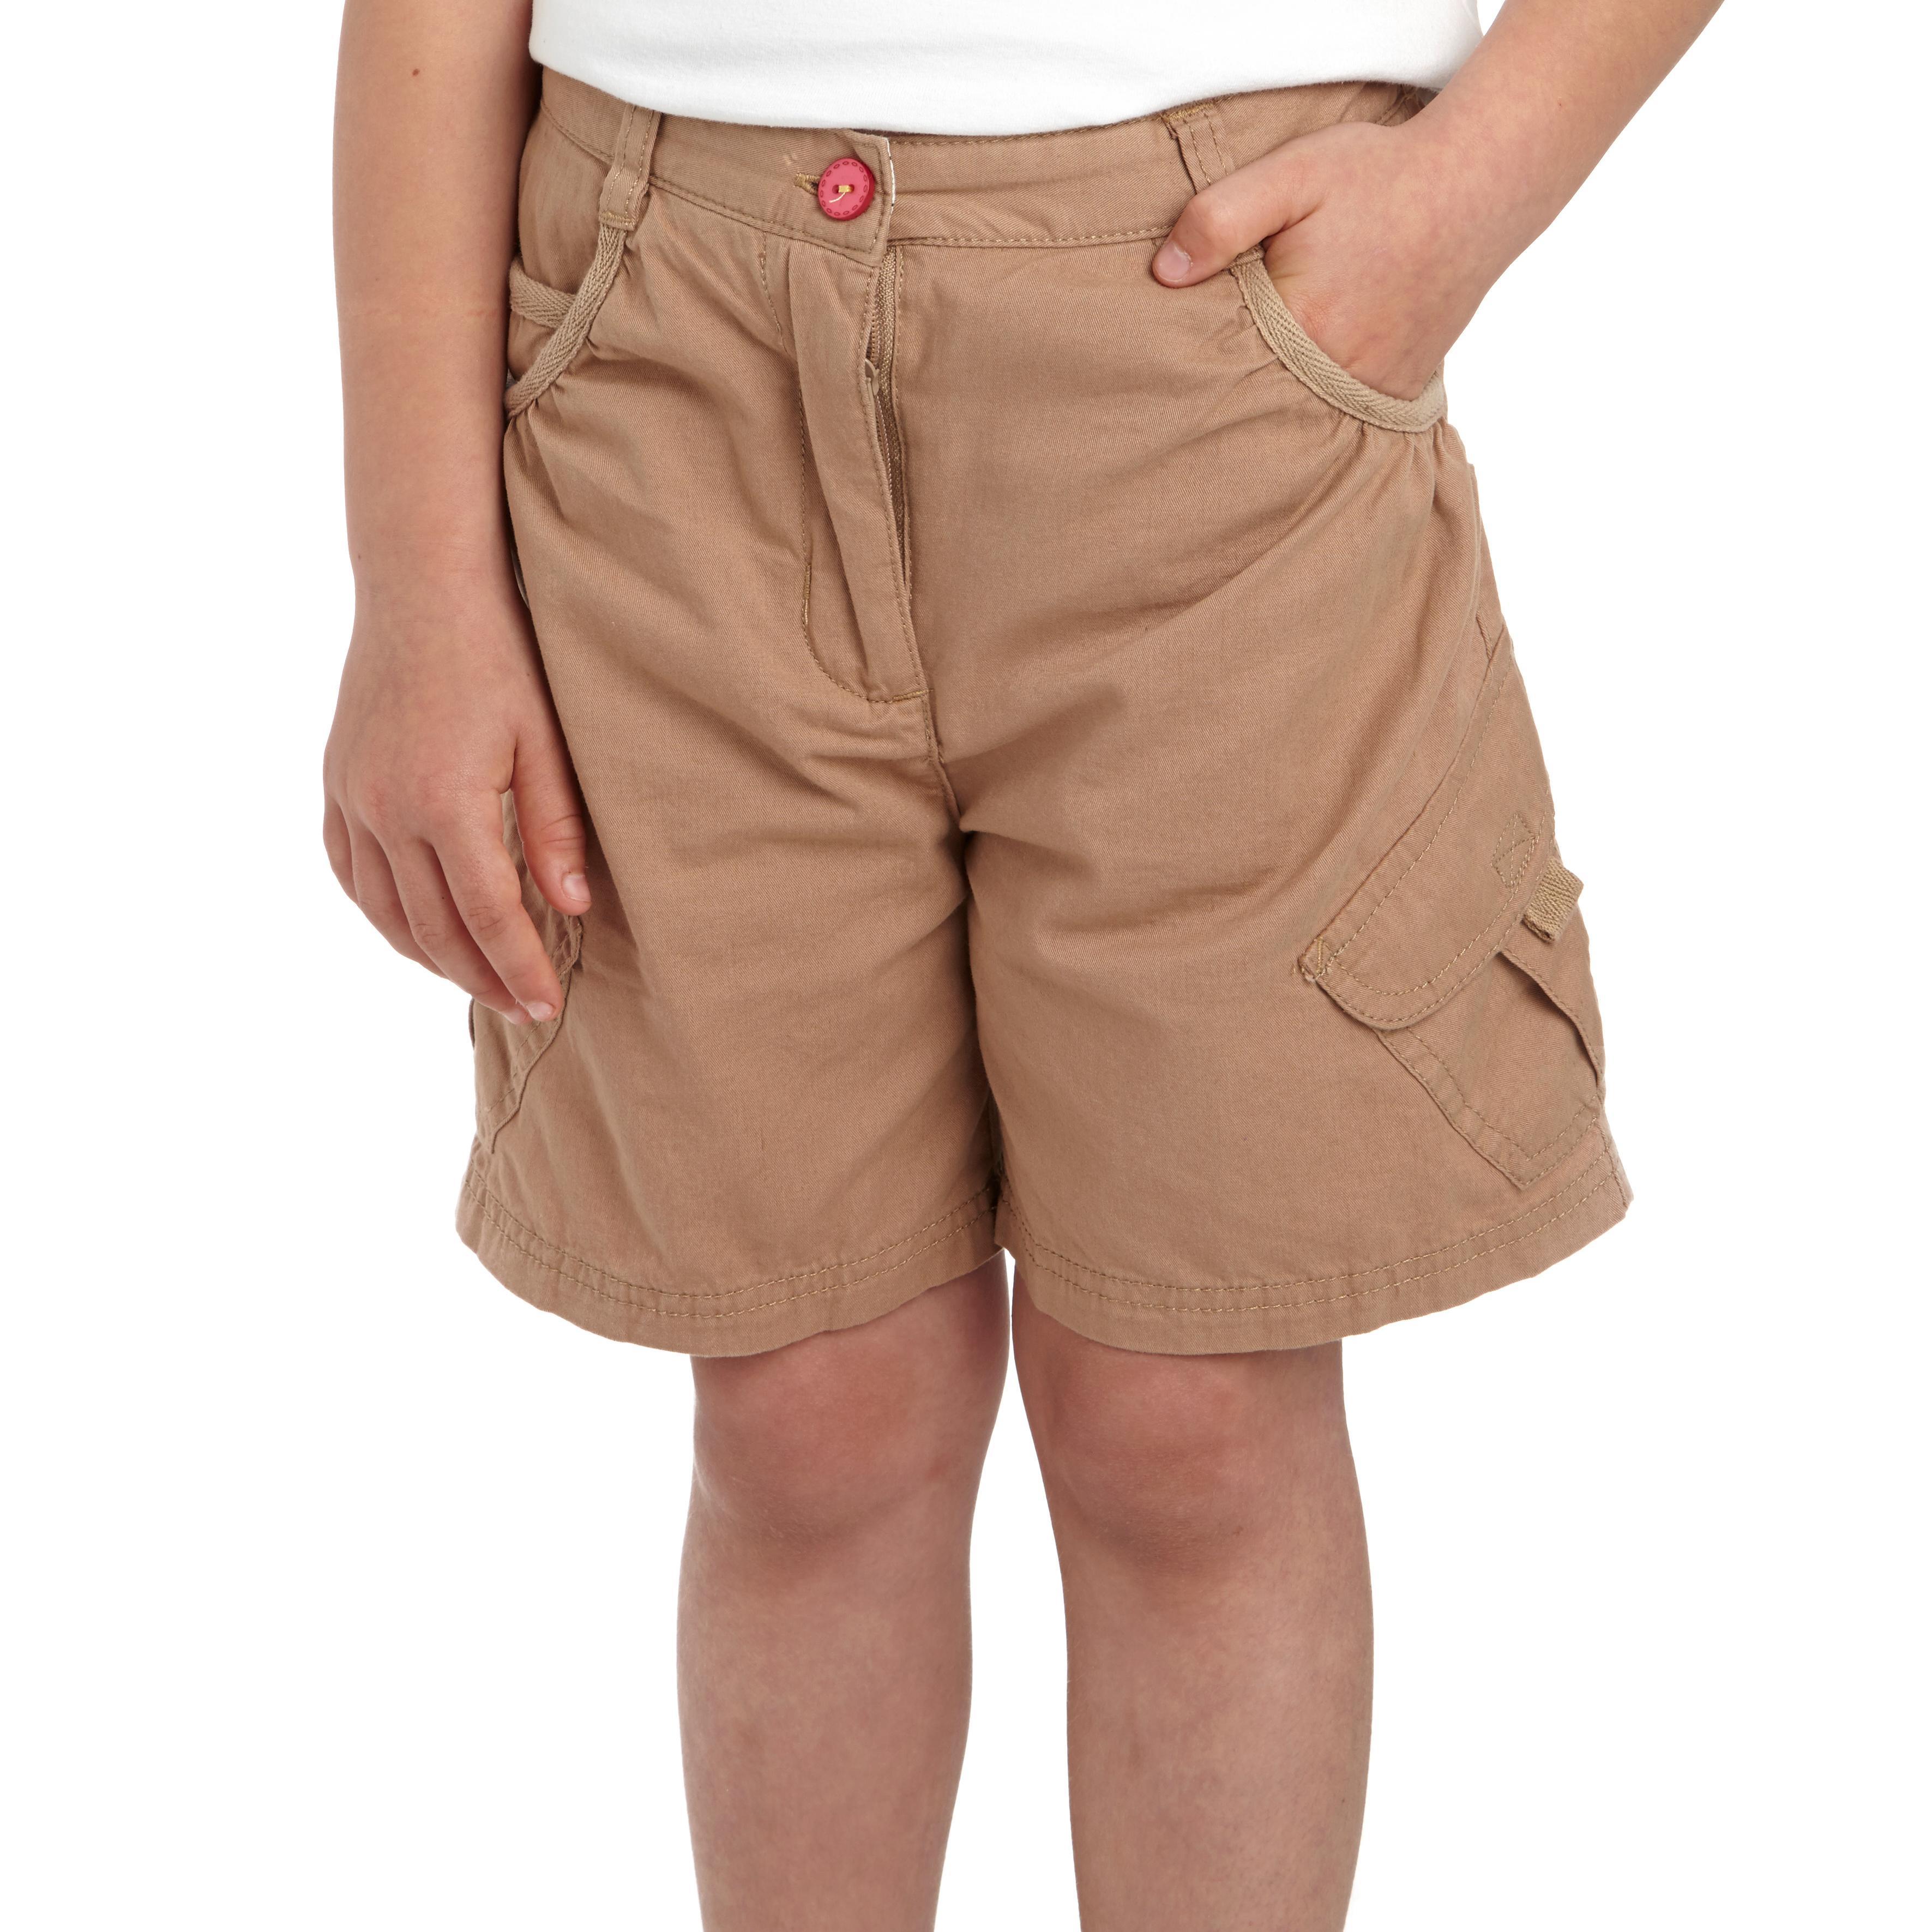 Regatta Moonshine Kids Coolweave Cotton Summer Shorts Pink